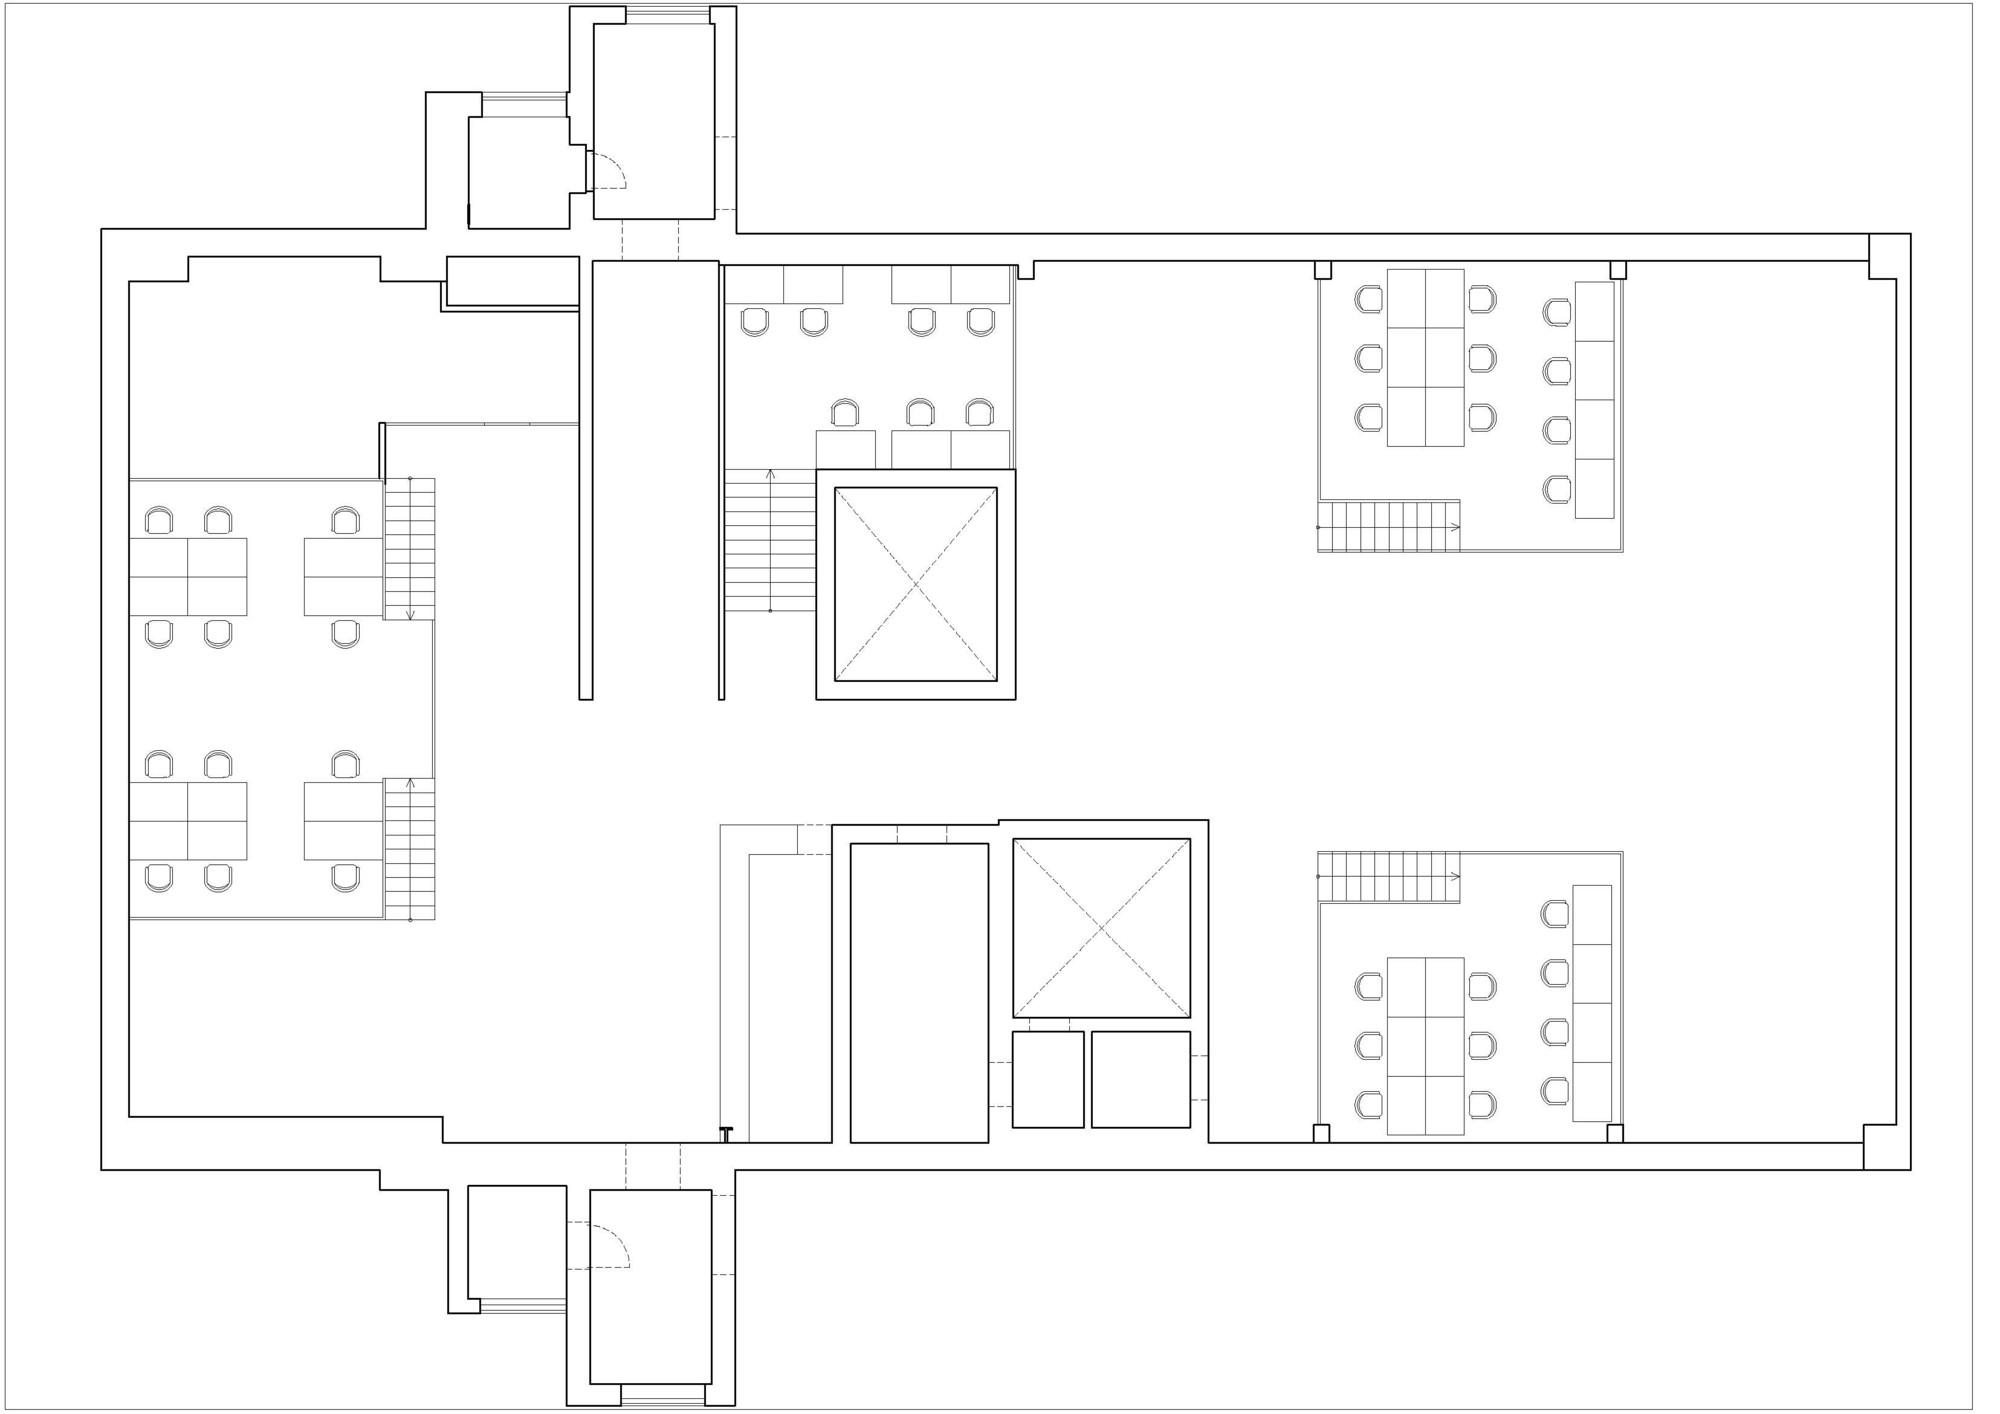 Nagatino 2.0 Coworking Center / Ruslan Aydarov Architecture Studio